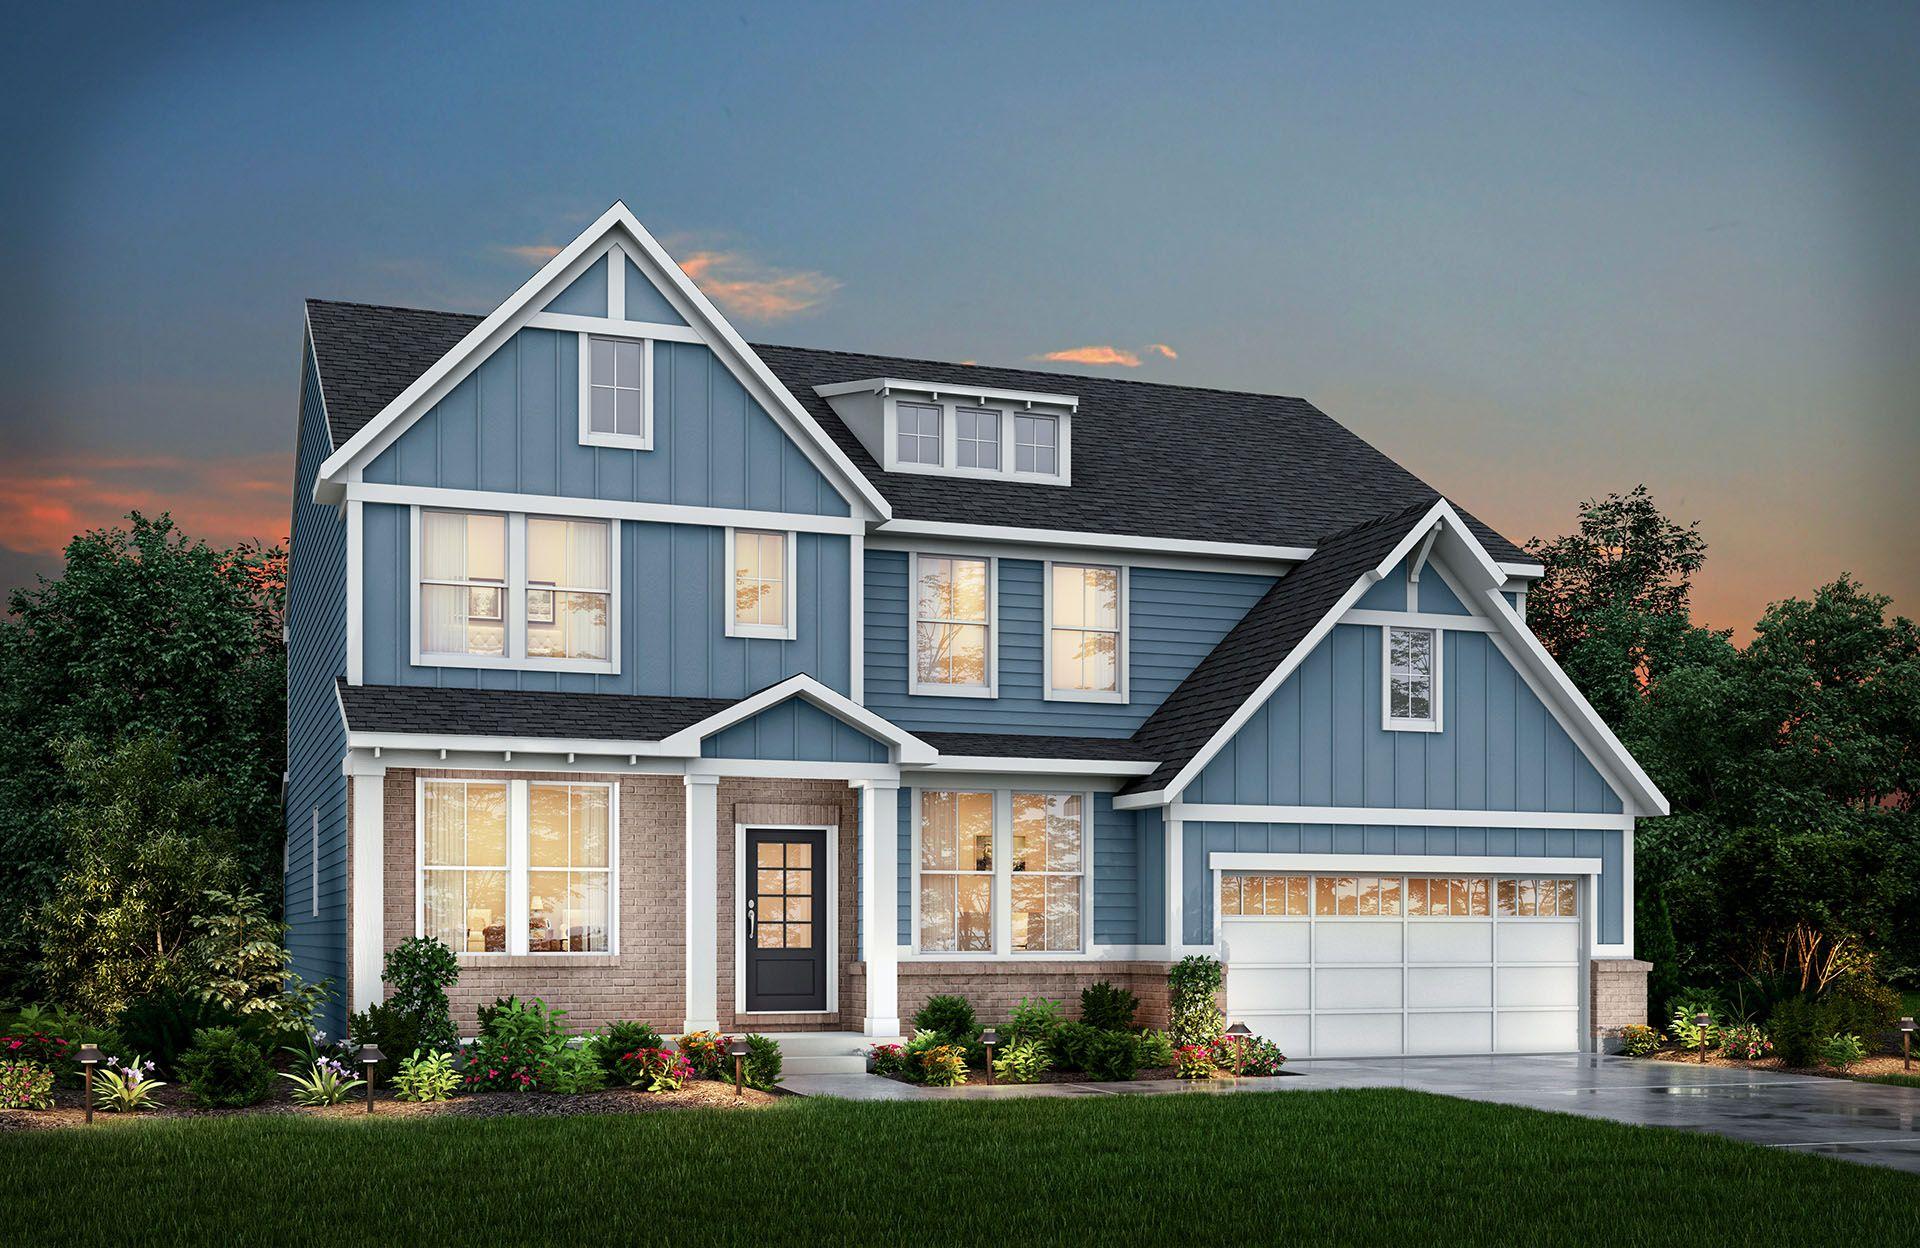 Single Family for Active at Vanderburgh 3141 Gray Hawk Drive Columbus, Indiana 47201 United States